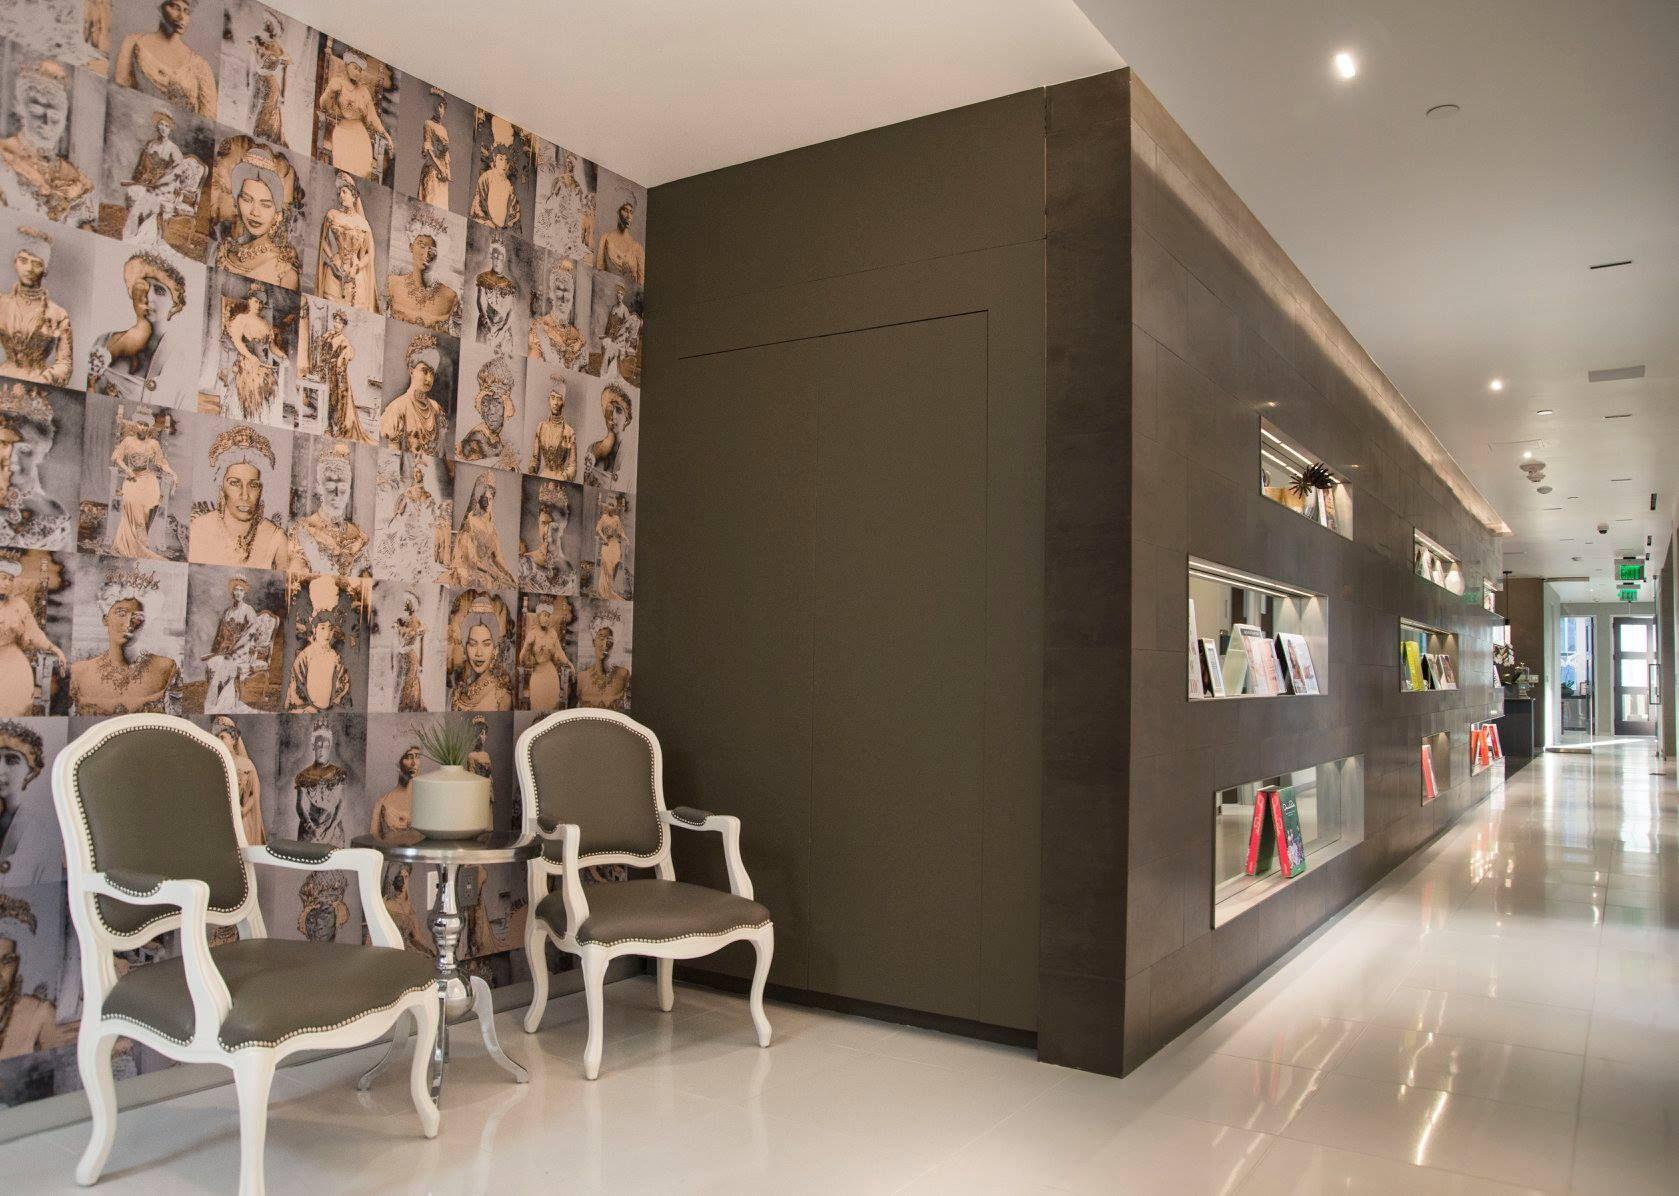 Interesting gallery wall Home decor, Decor, Room divider